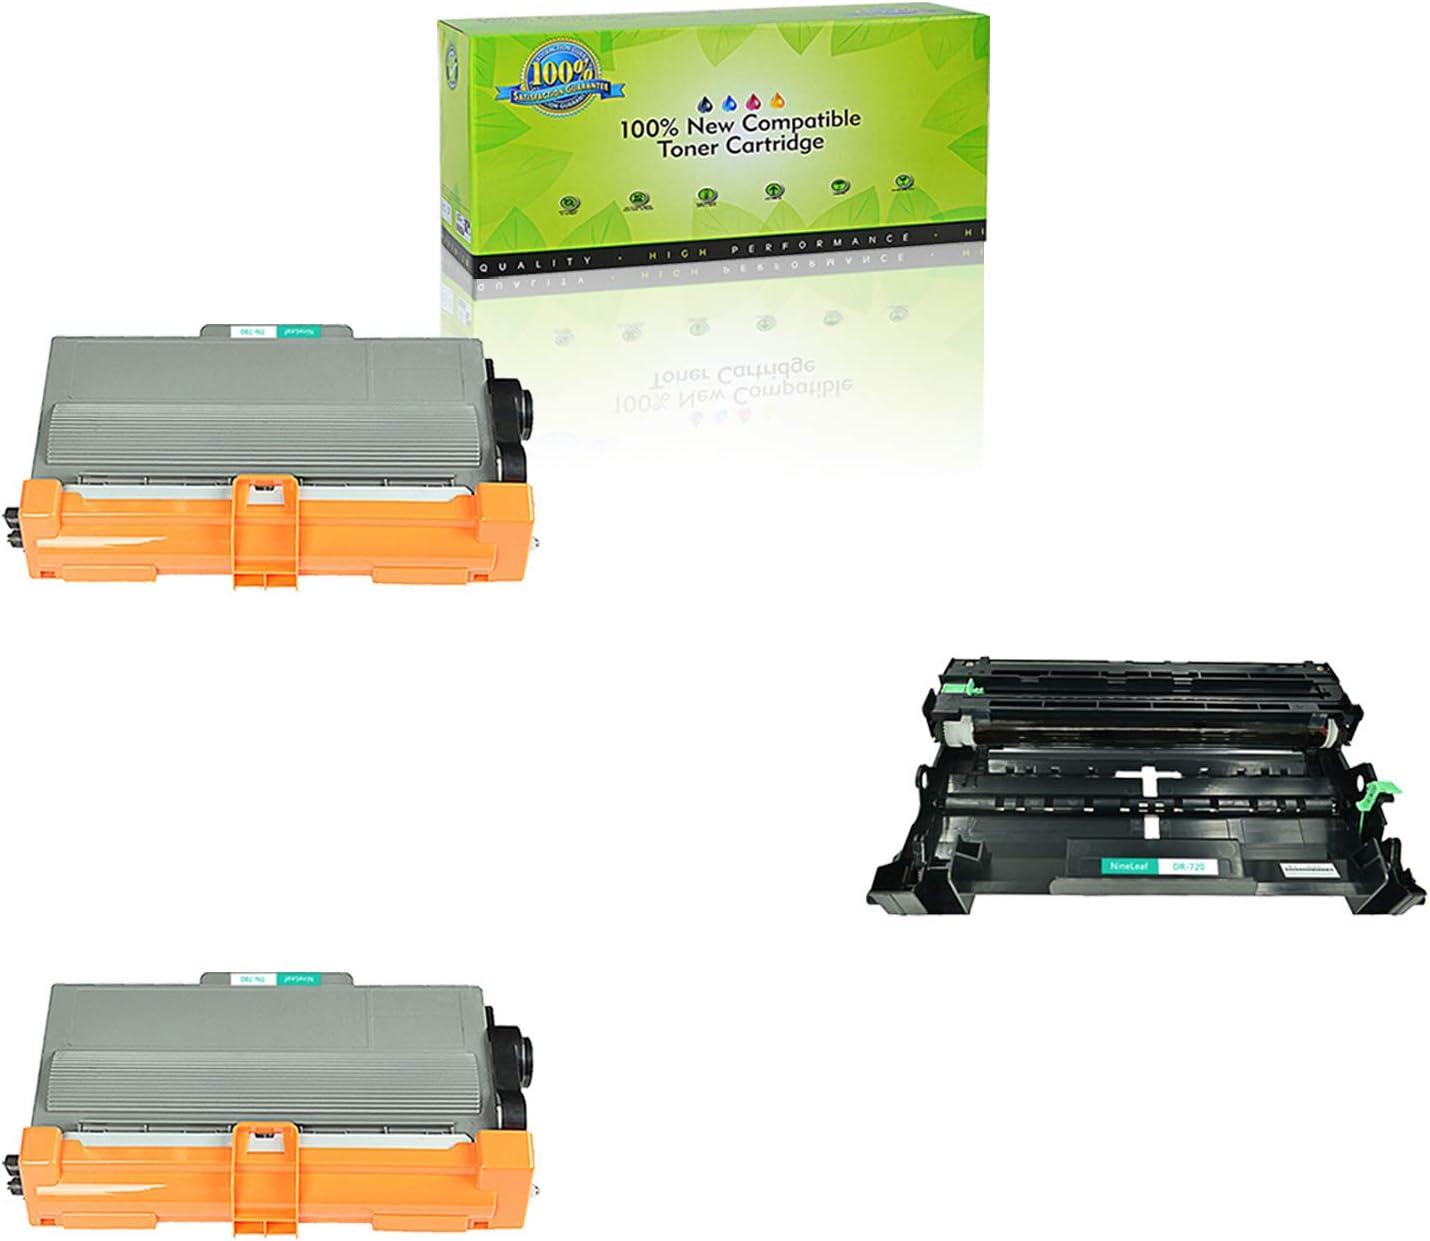 2PK High Yield Toner Cartridge TN780 TN-780 Fit Brother HL-6180DWT Printer